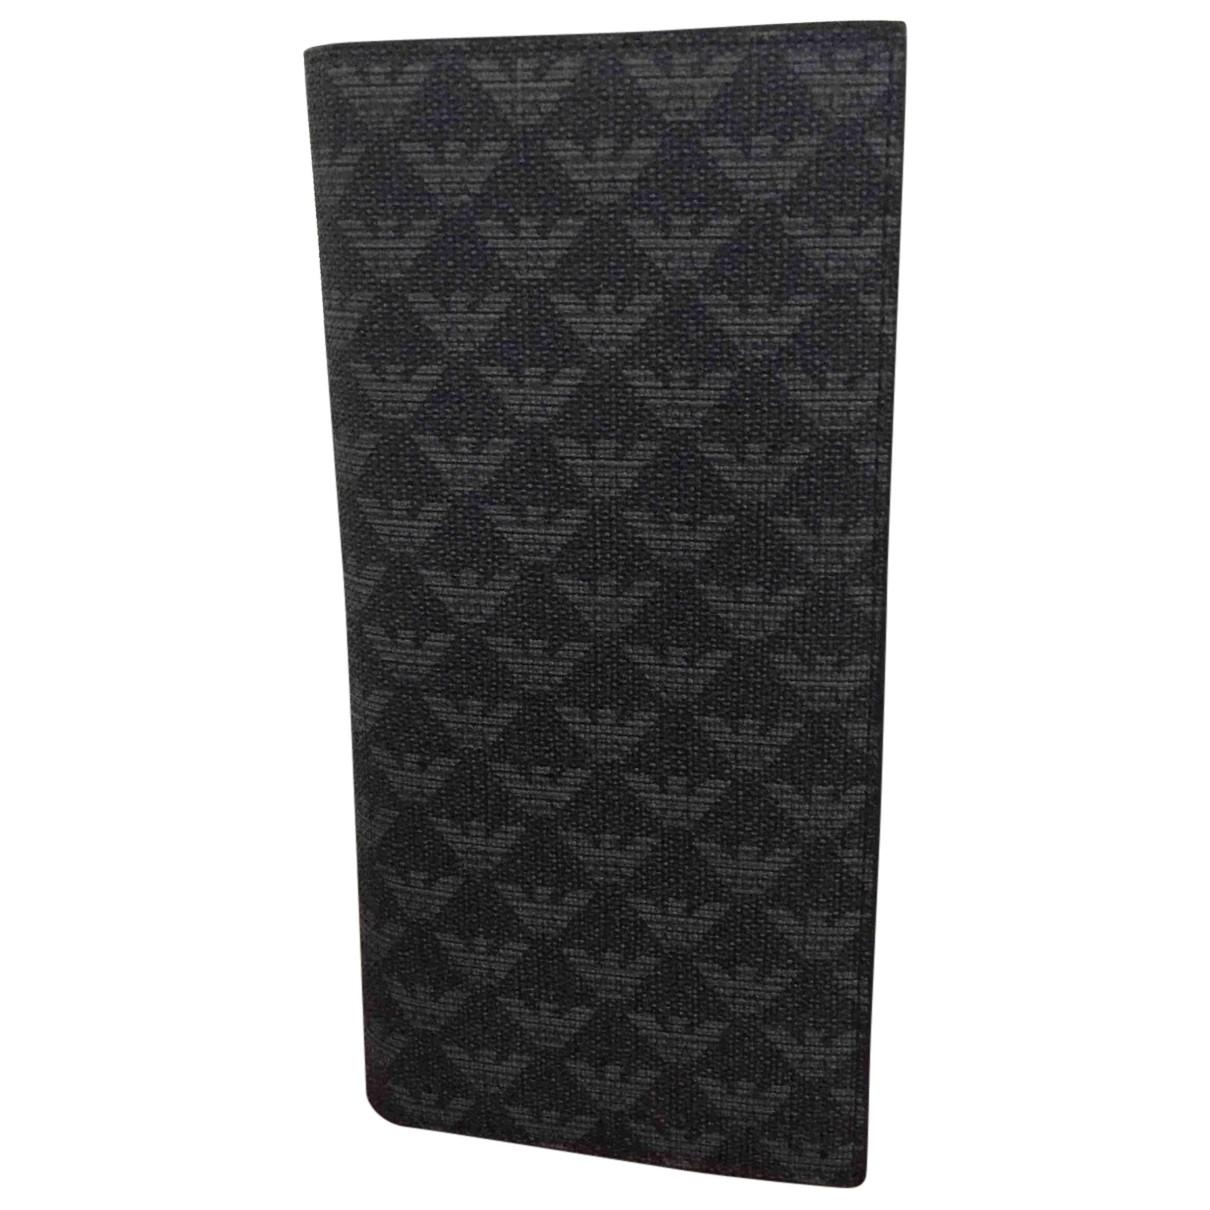 Emporio Armani N Black Cloth Small bag, wallet & cases for Men N